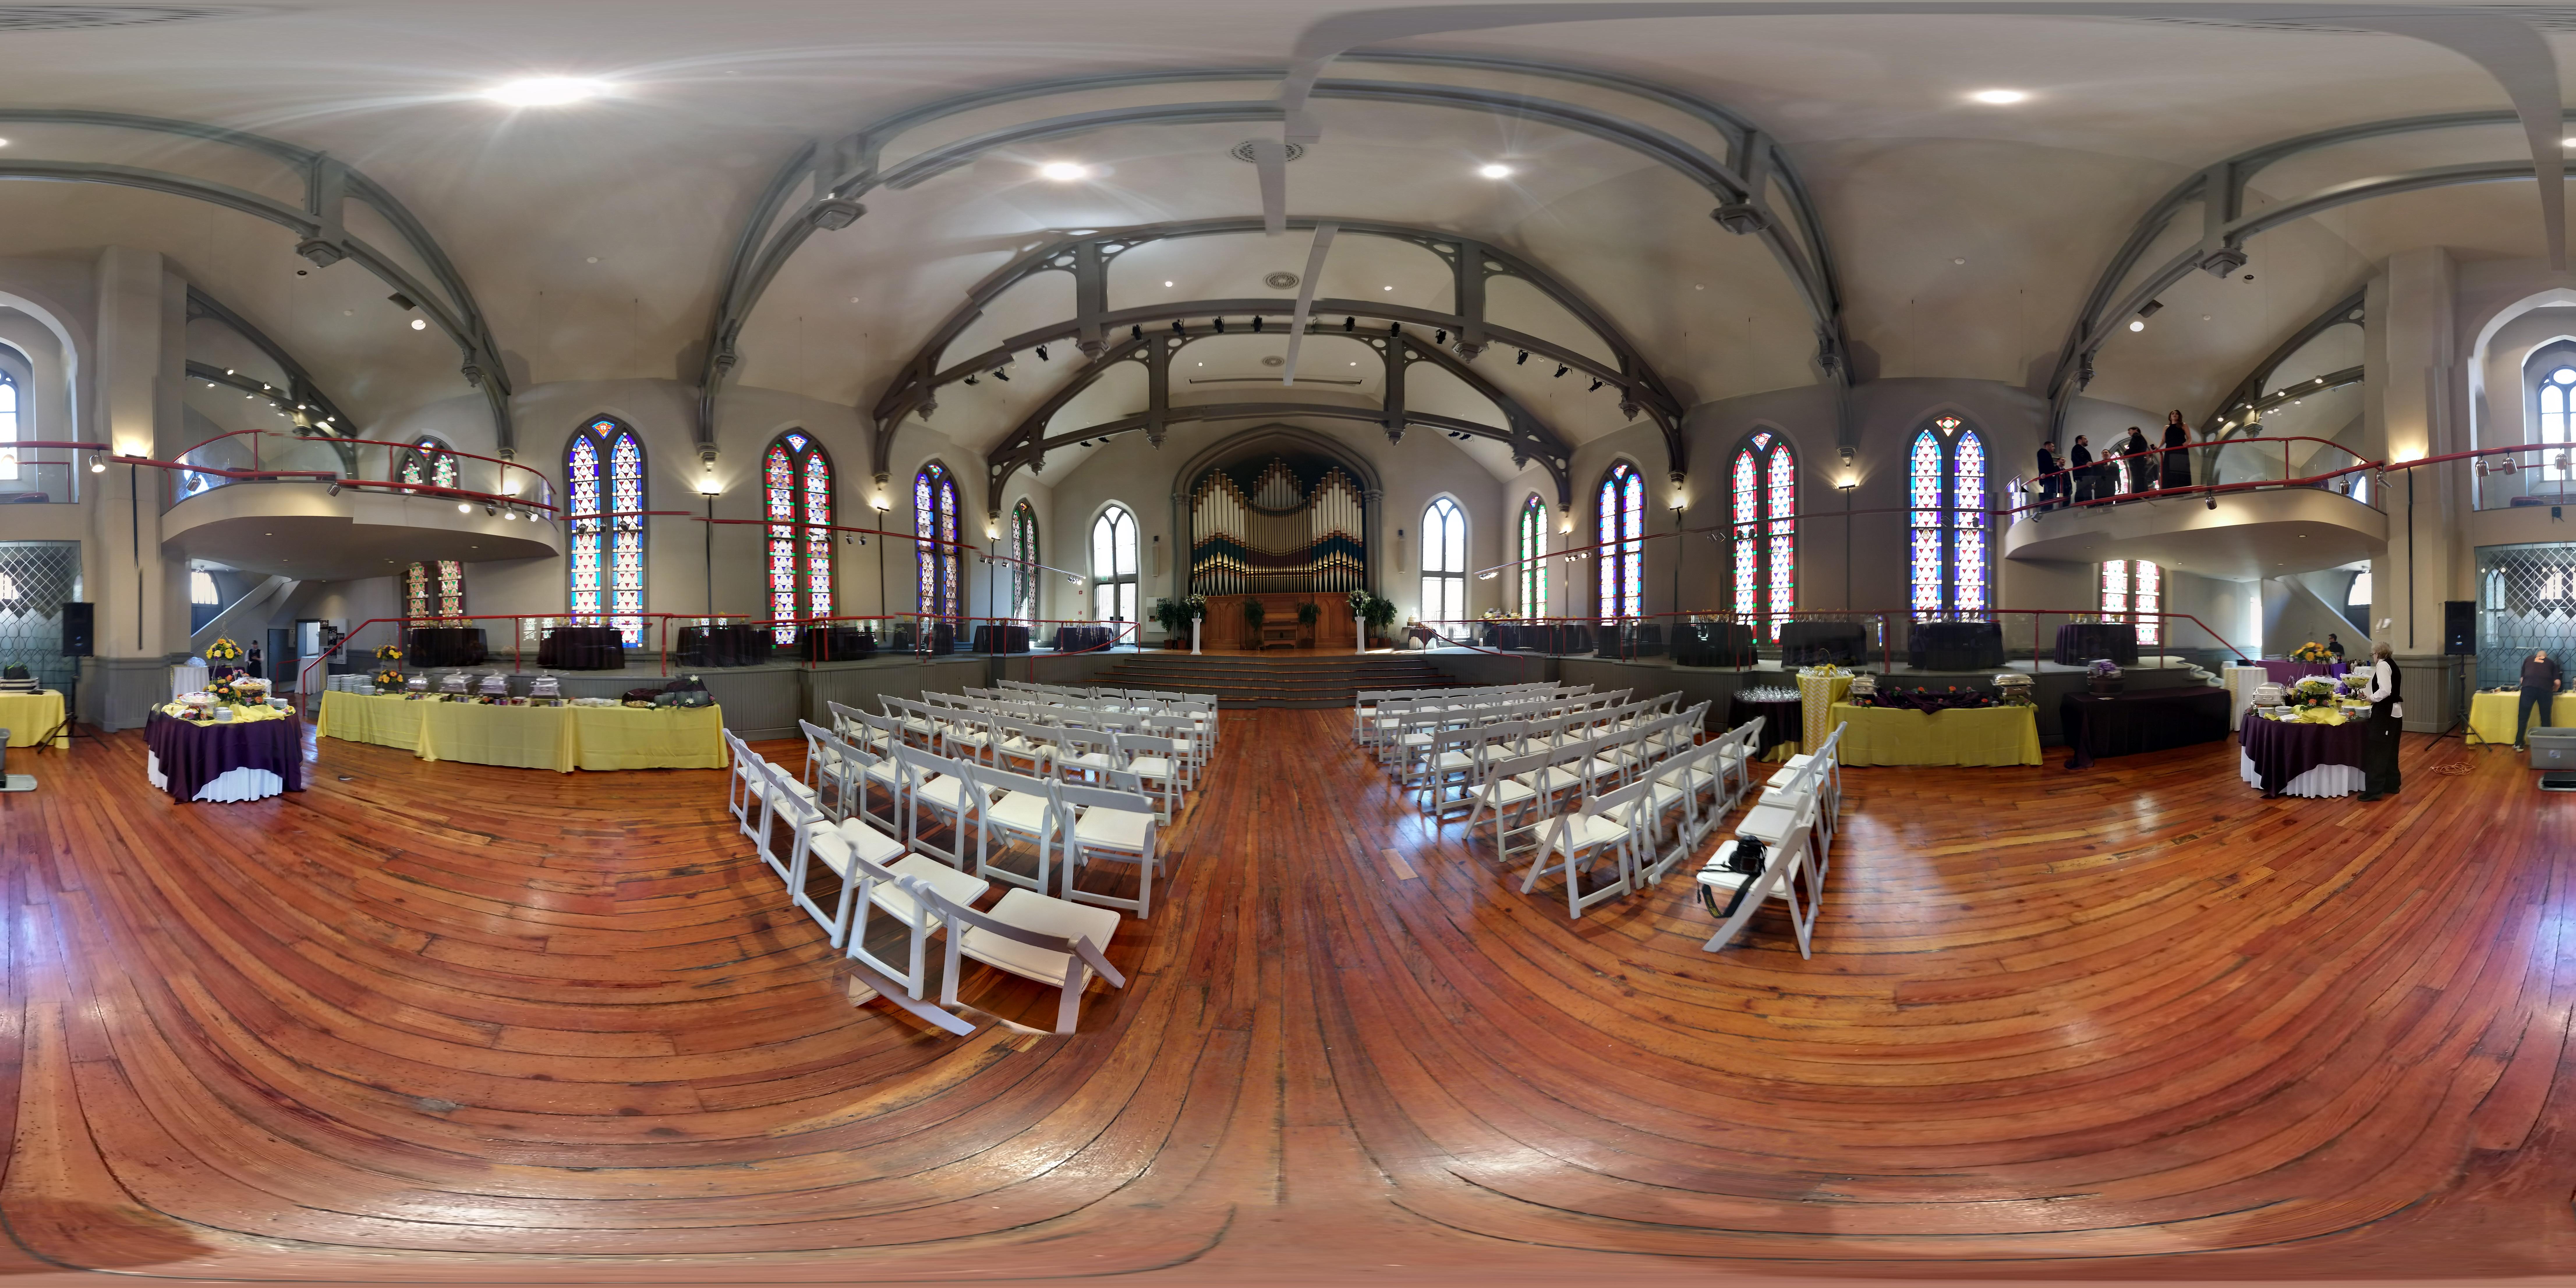 Vr 360 Wedding Ceremony: Annapolis Wedding Photographers